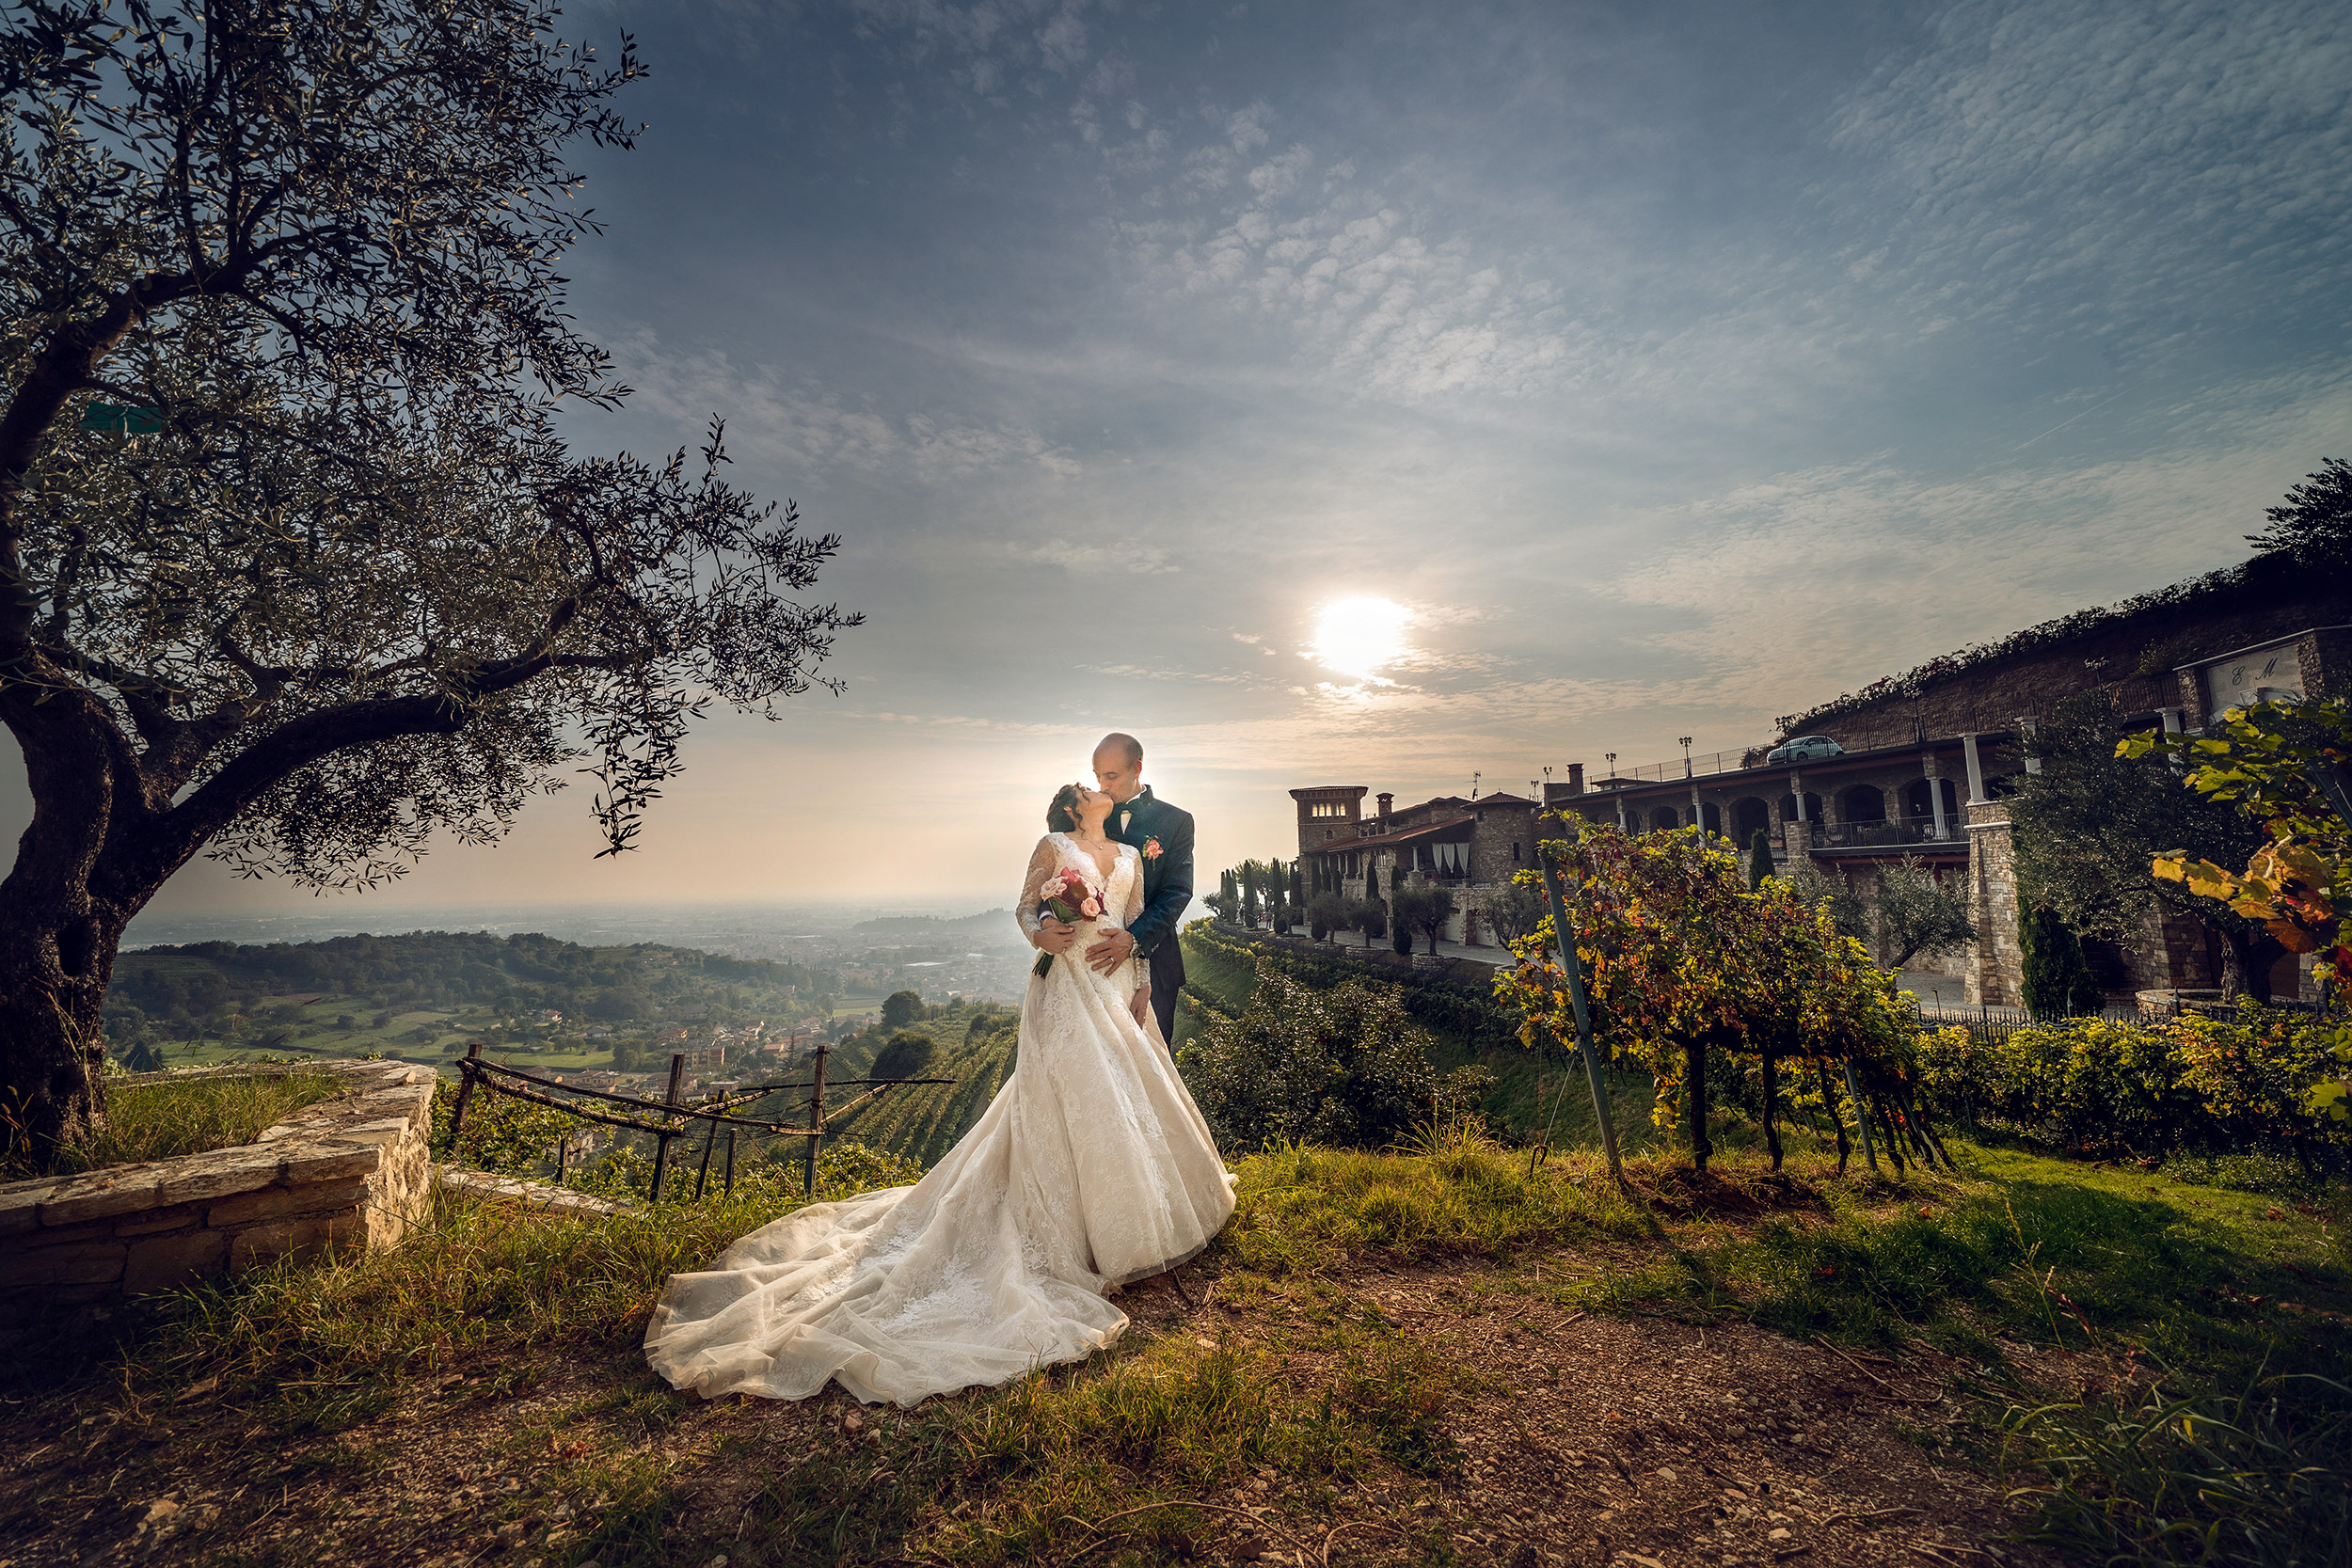 000 reportage sposi foto matrimonio wedding cantorie gussago brescia 1